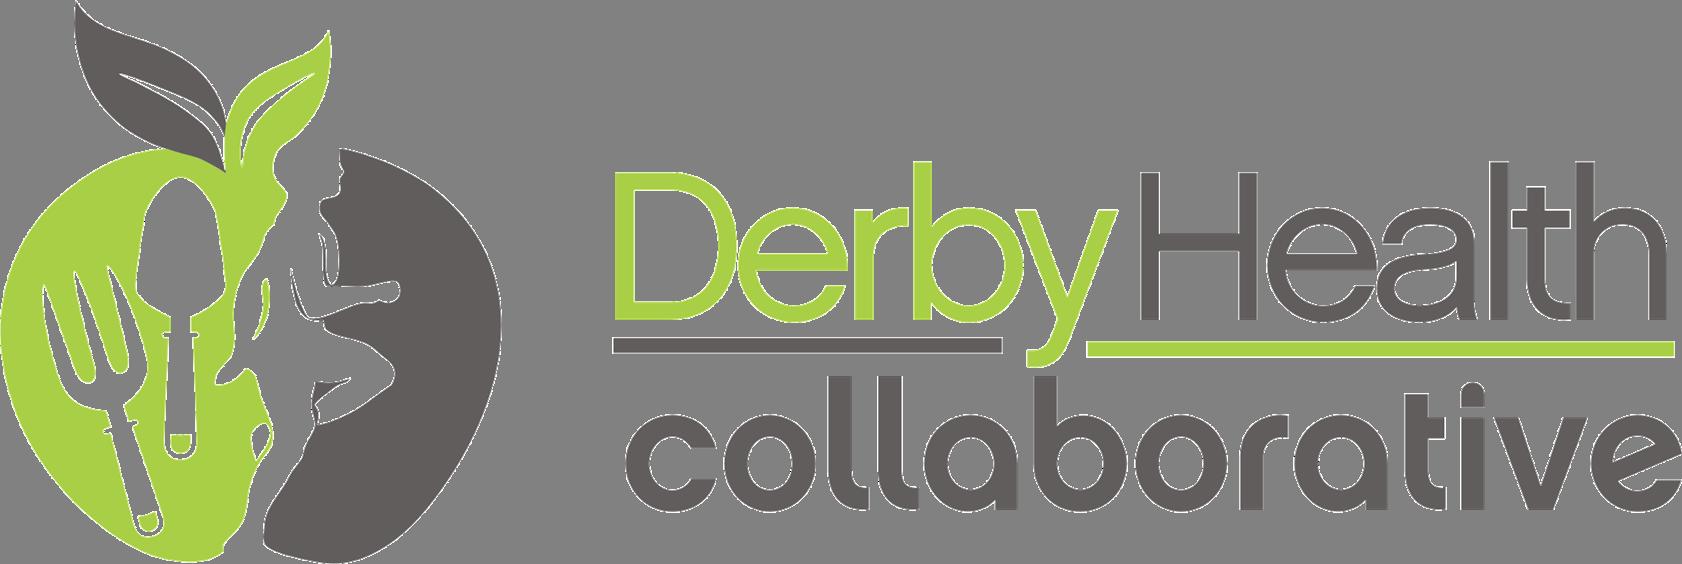 Collaborative Logo Transparent - Copy.png